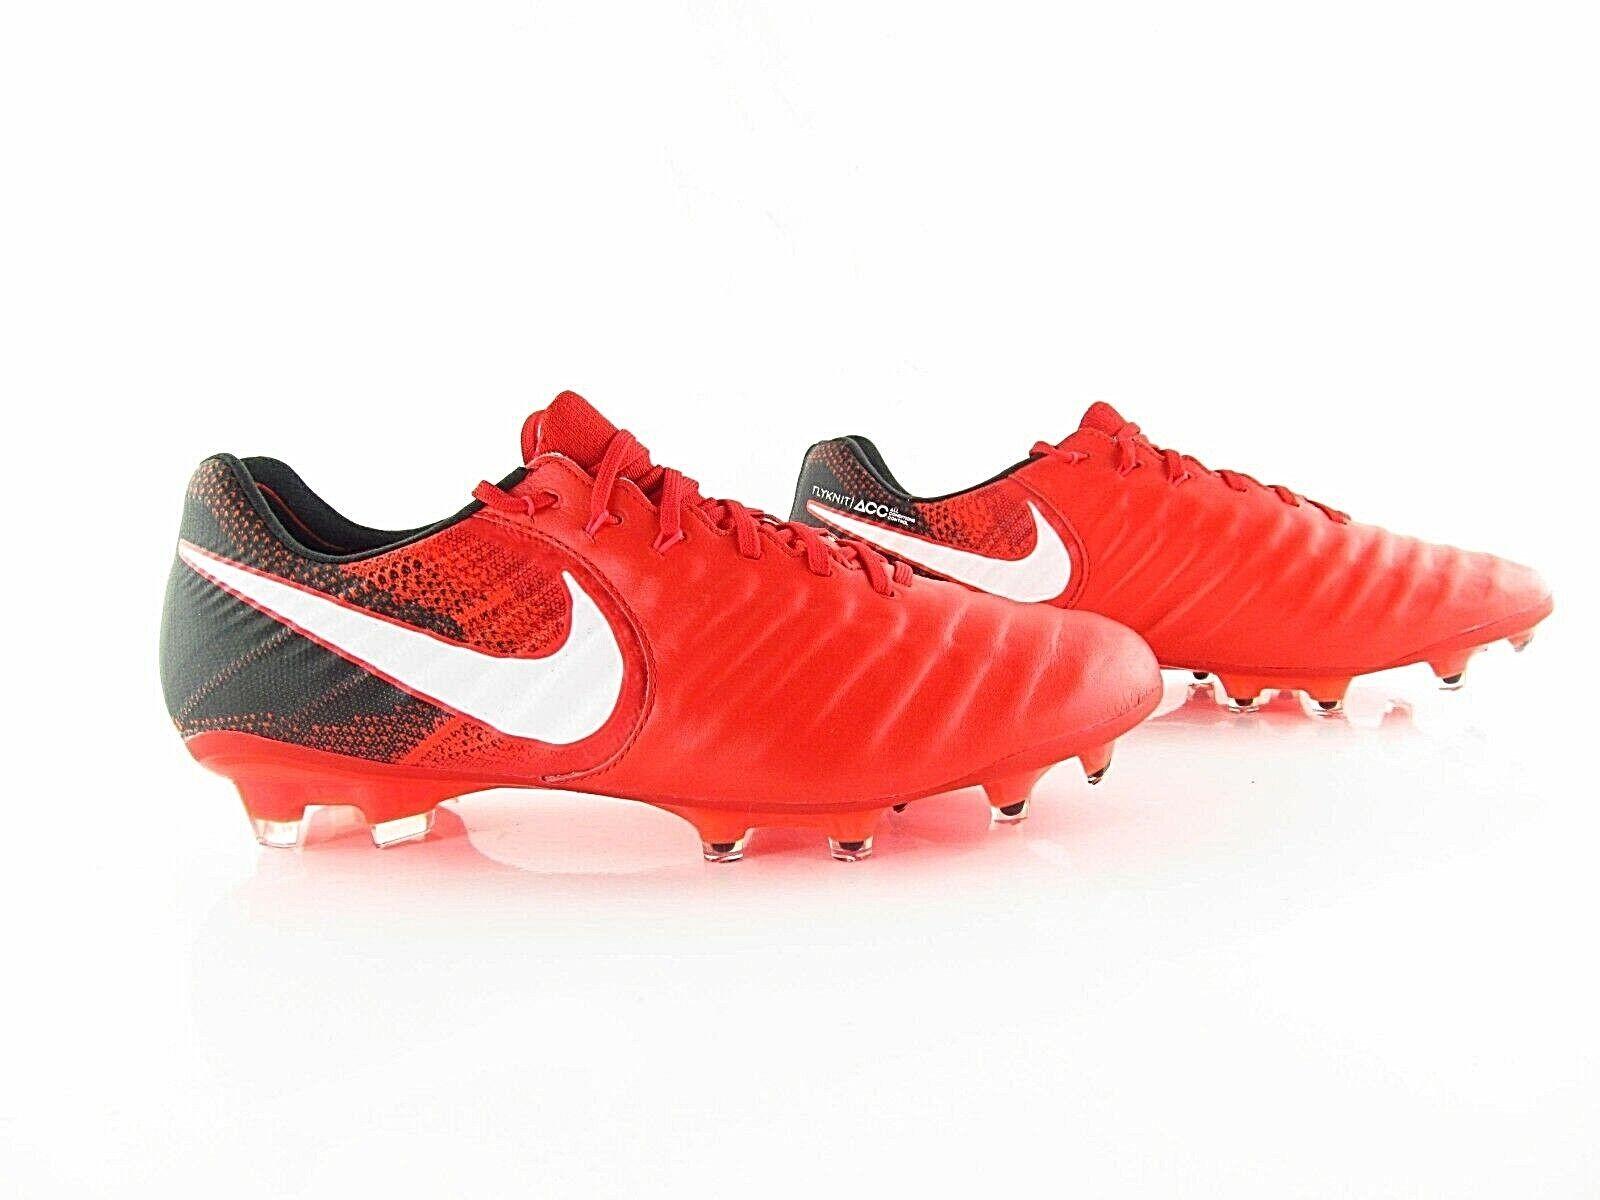 Nike tiempo legend VII FG acc futbol 897751 616 us_7 8.5 eur_40 42